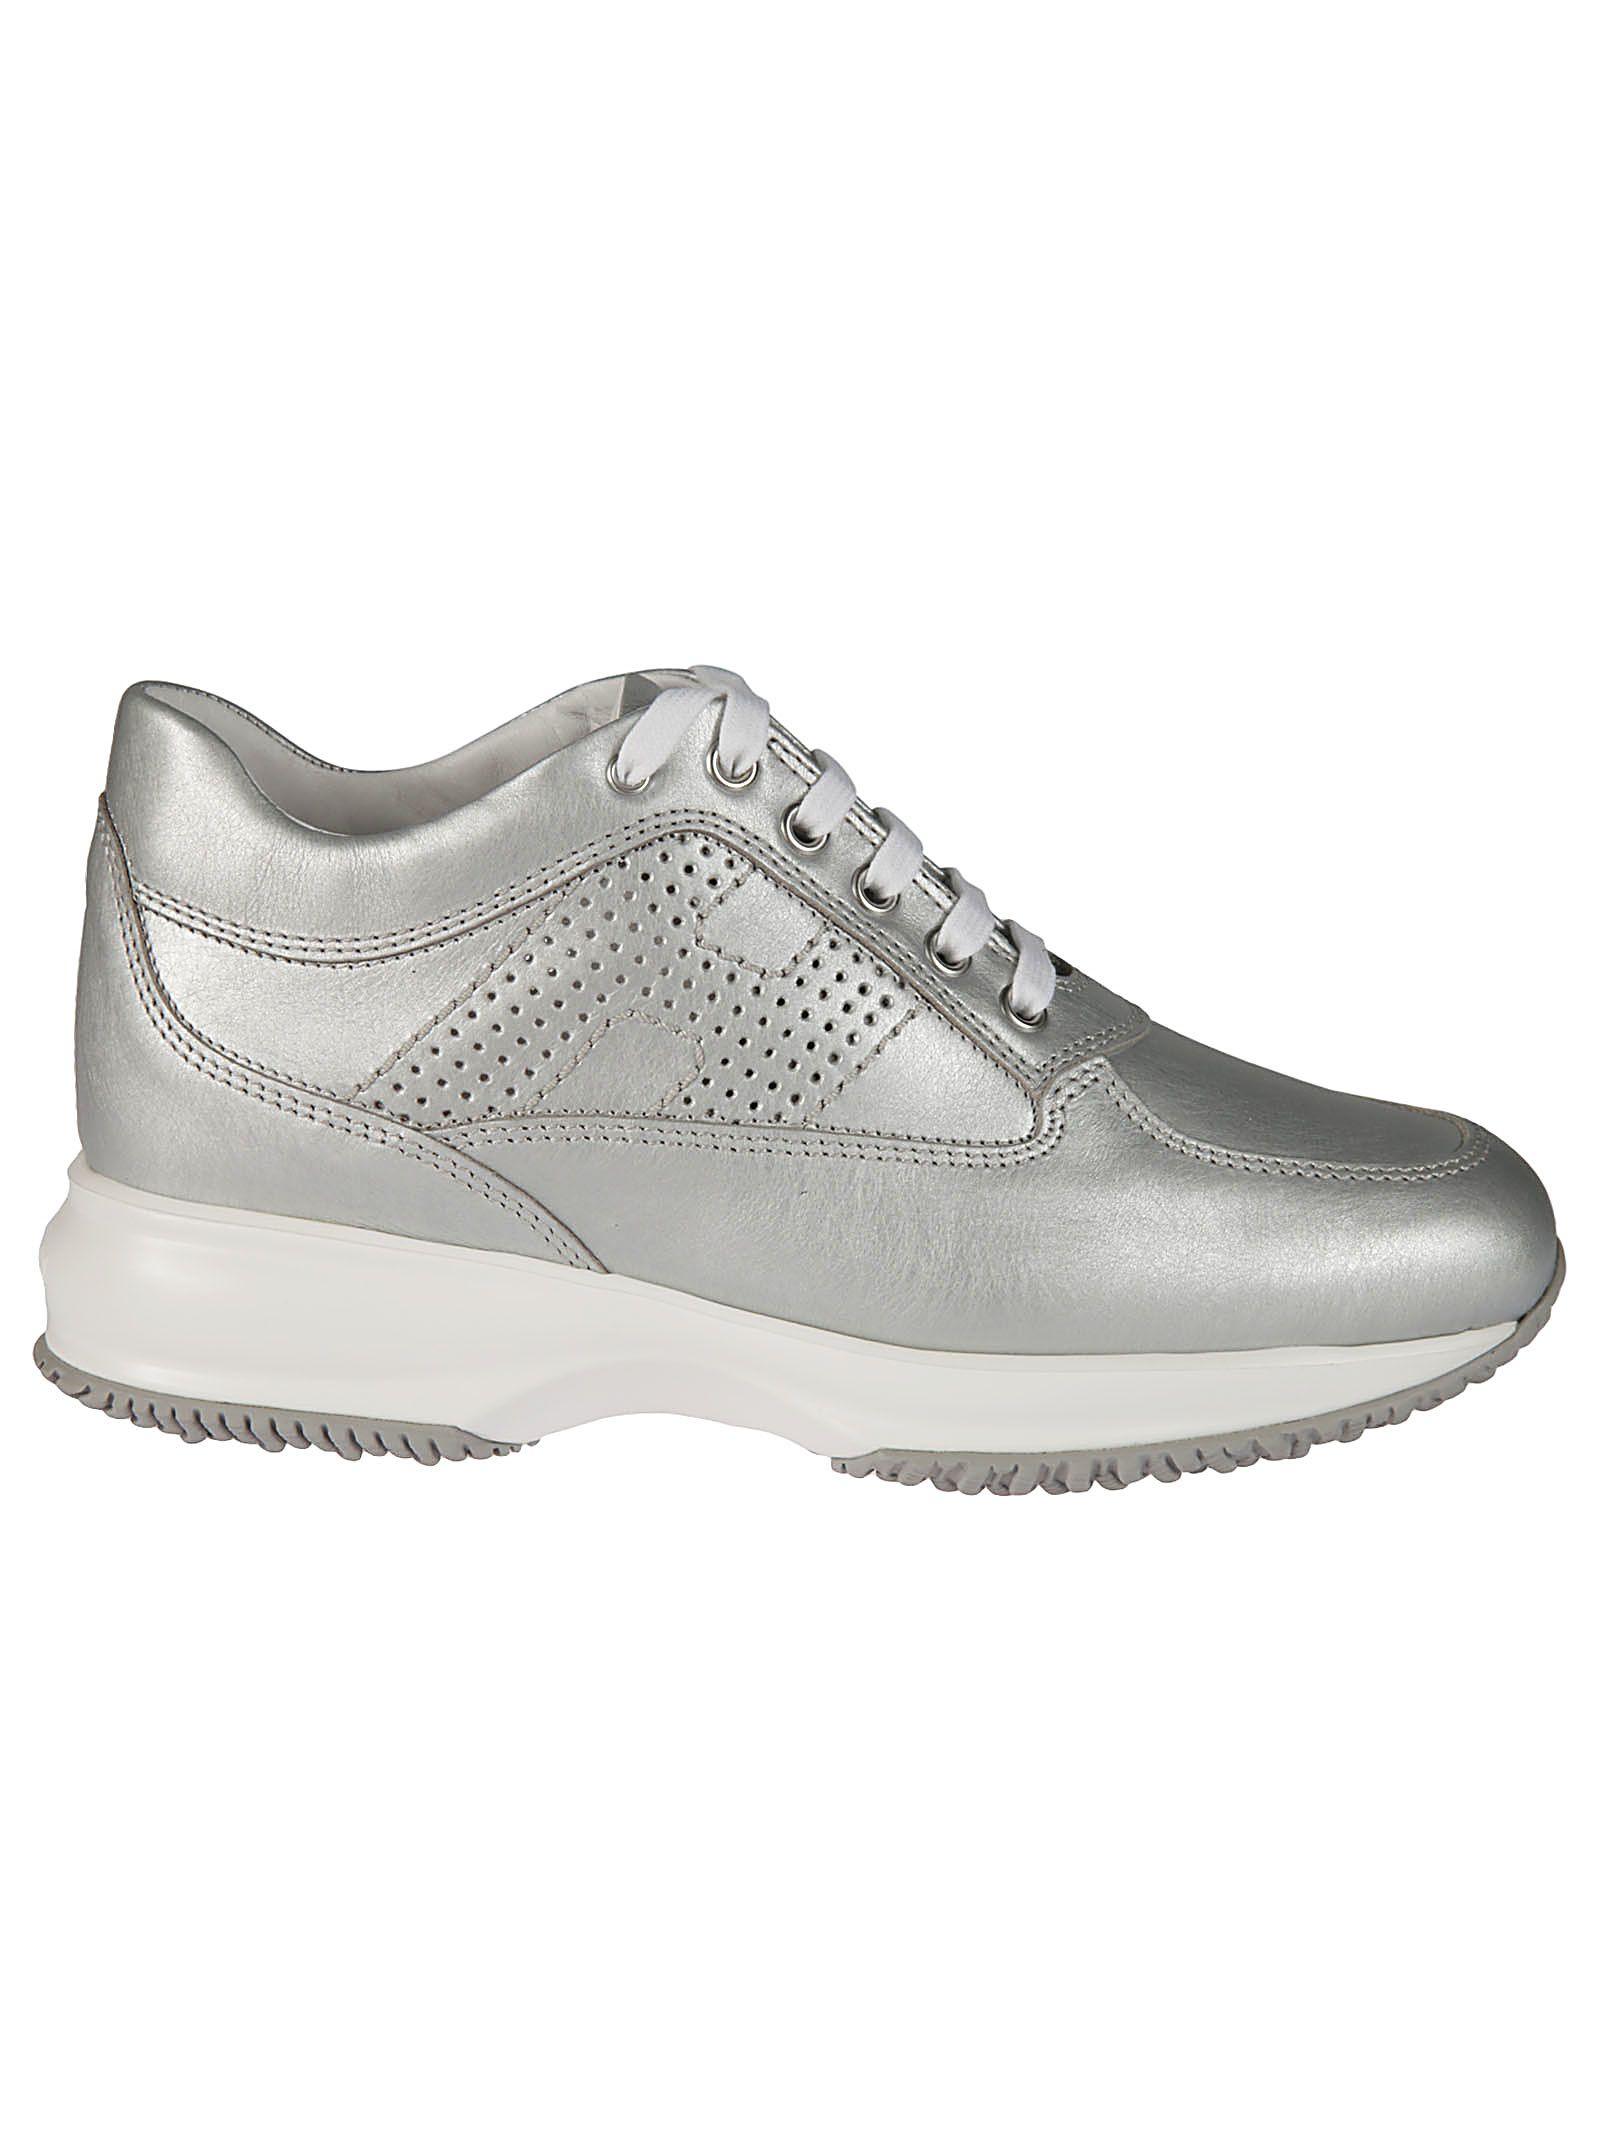 5adfc455930 Hogan Hogan Interactive Sneakers - silver - 10600503   italist